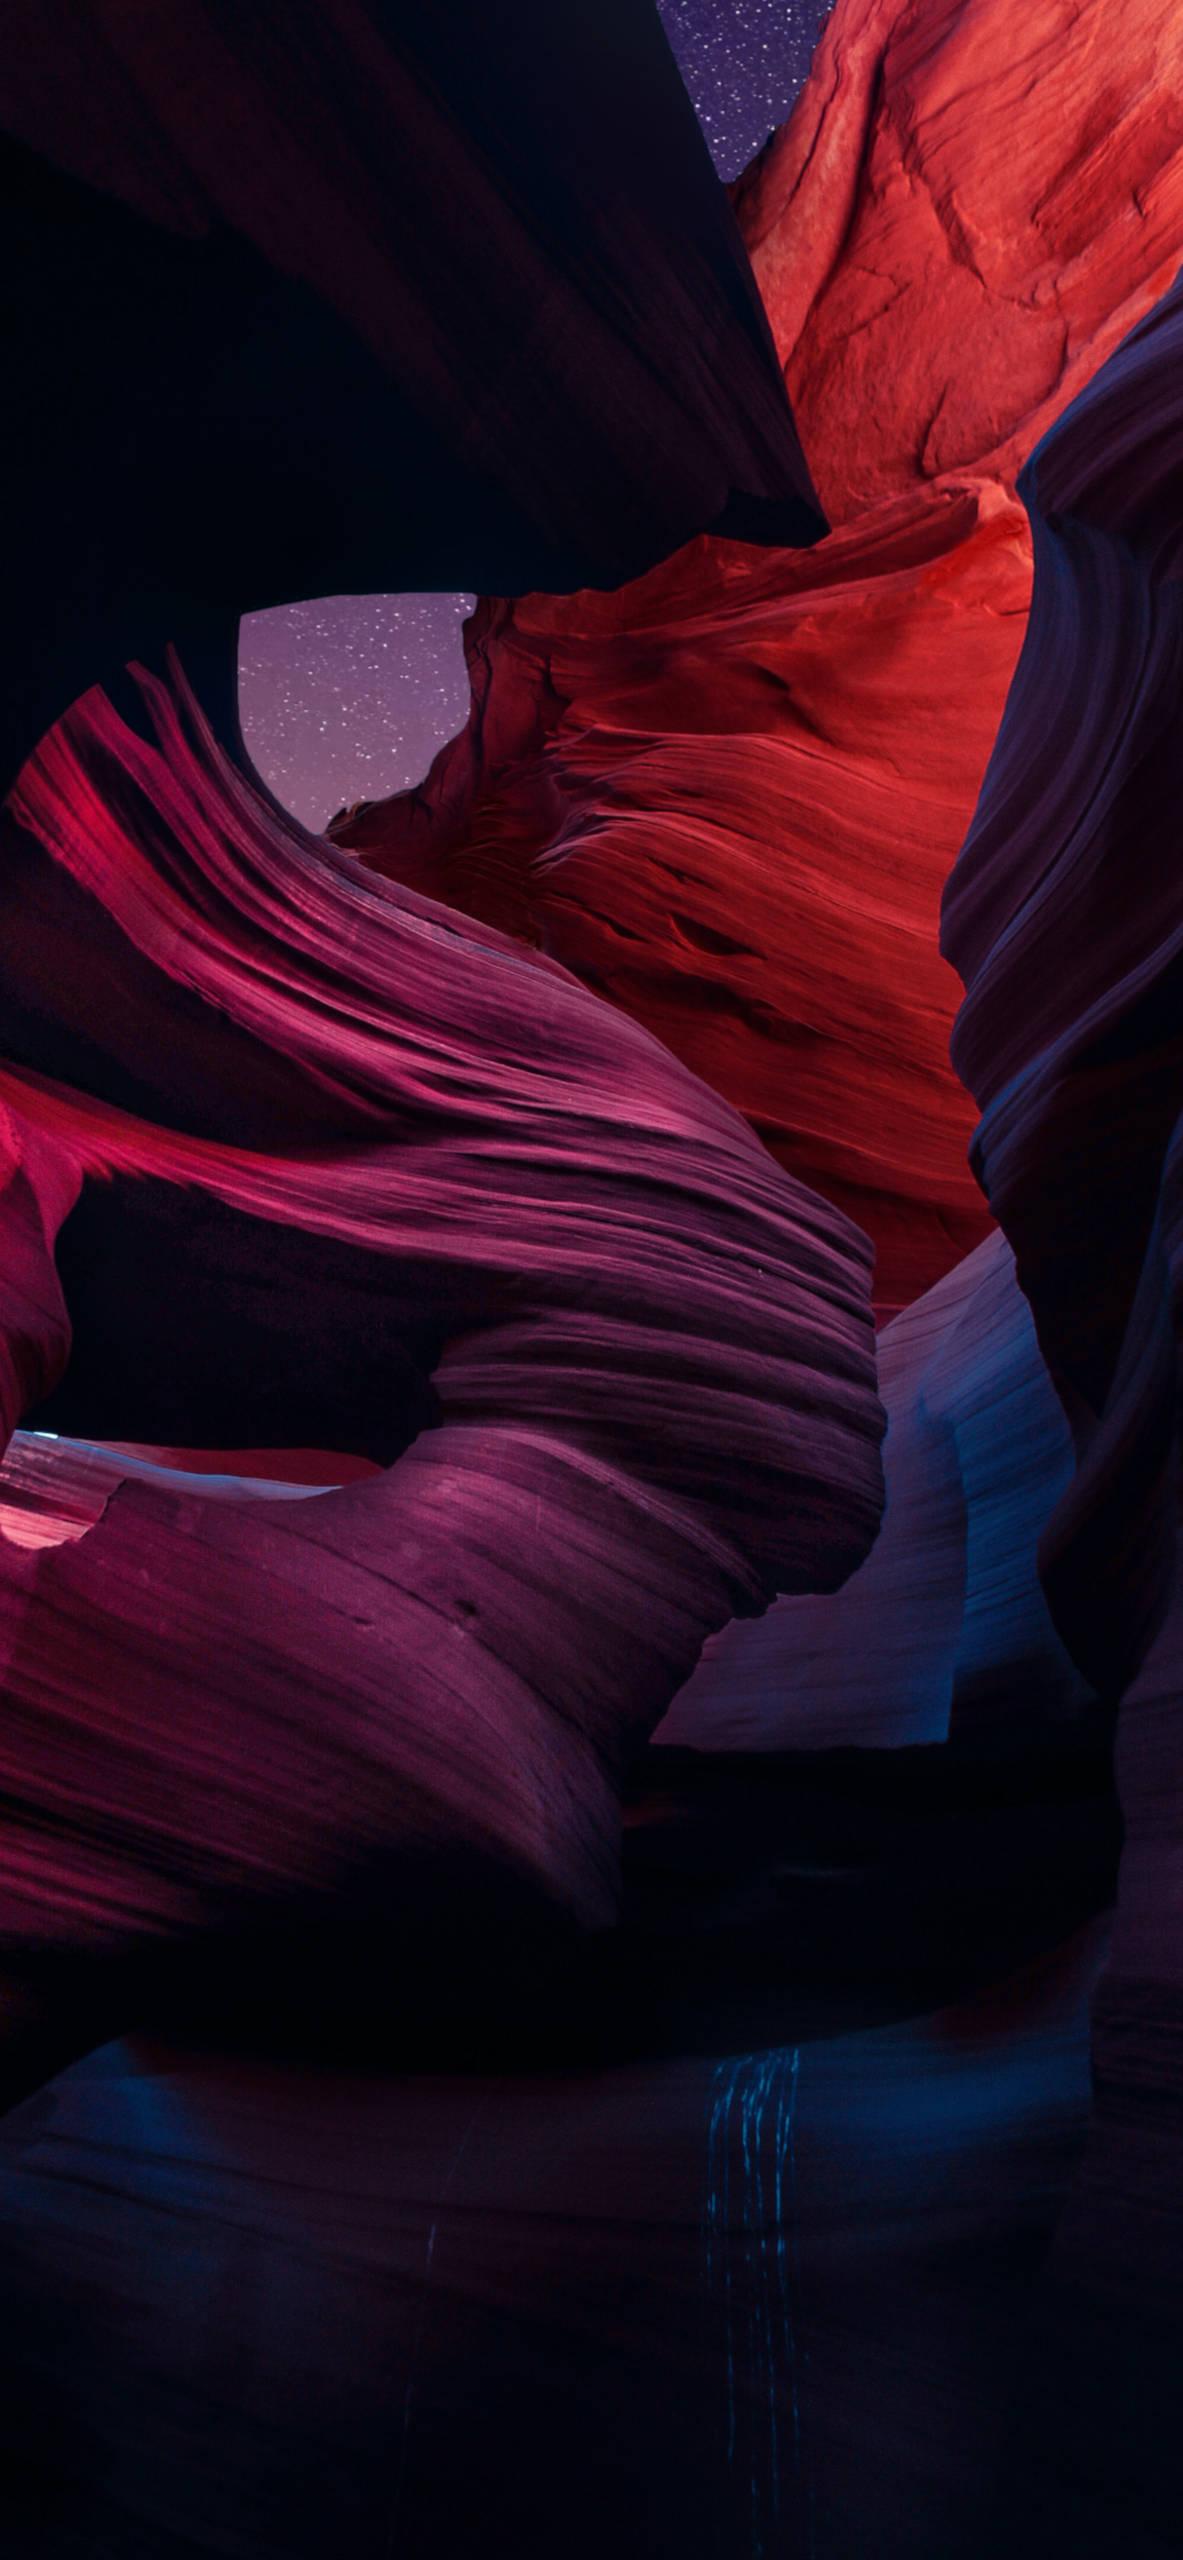 iPhone wallpapers antelope canyon usa Antelope Canyon